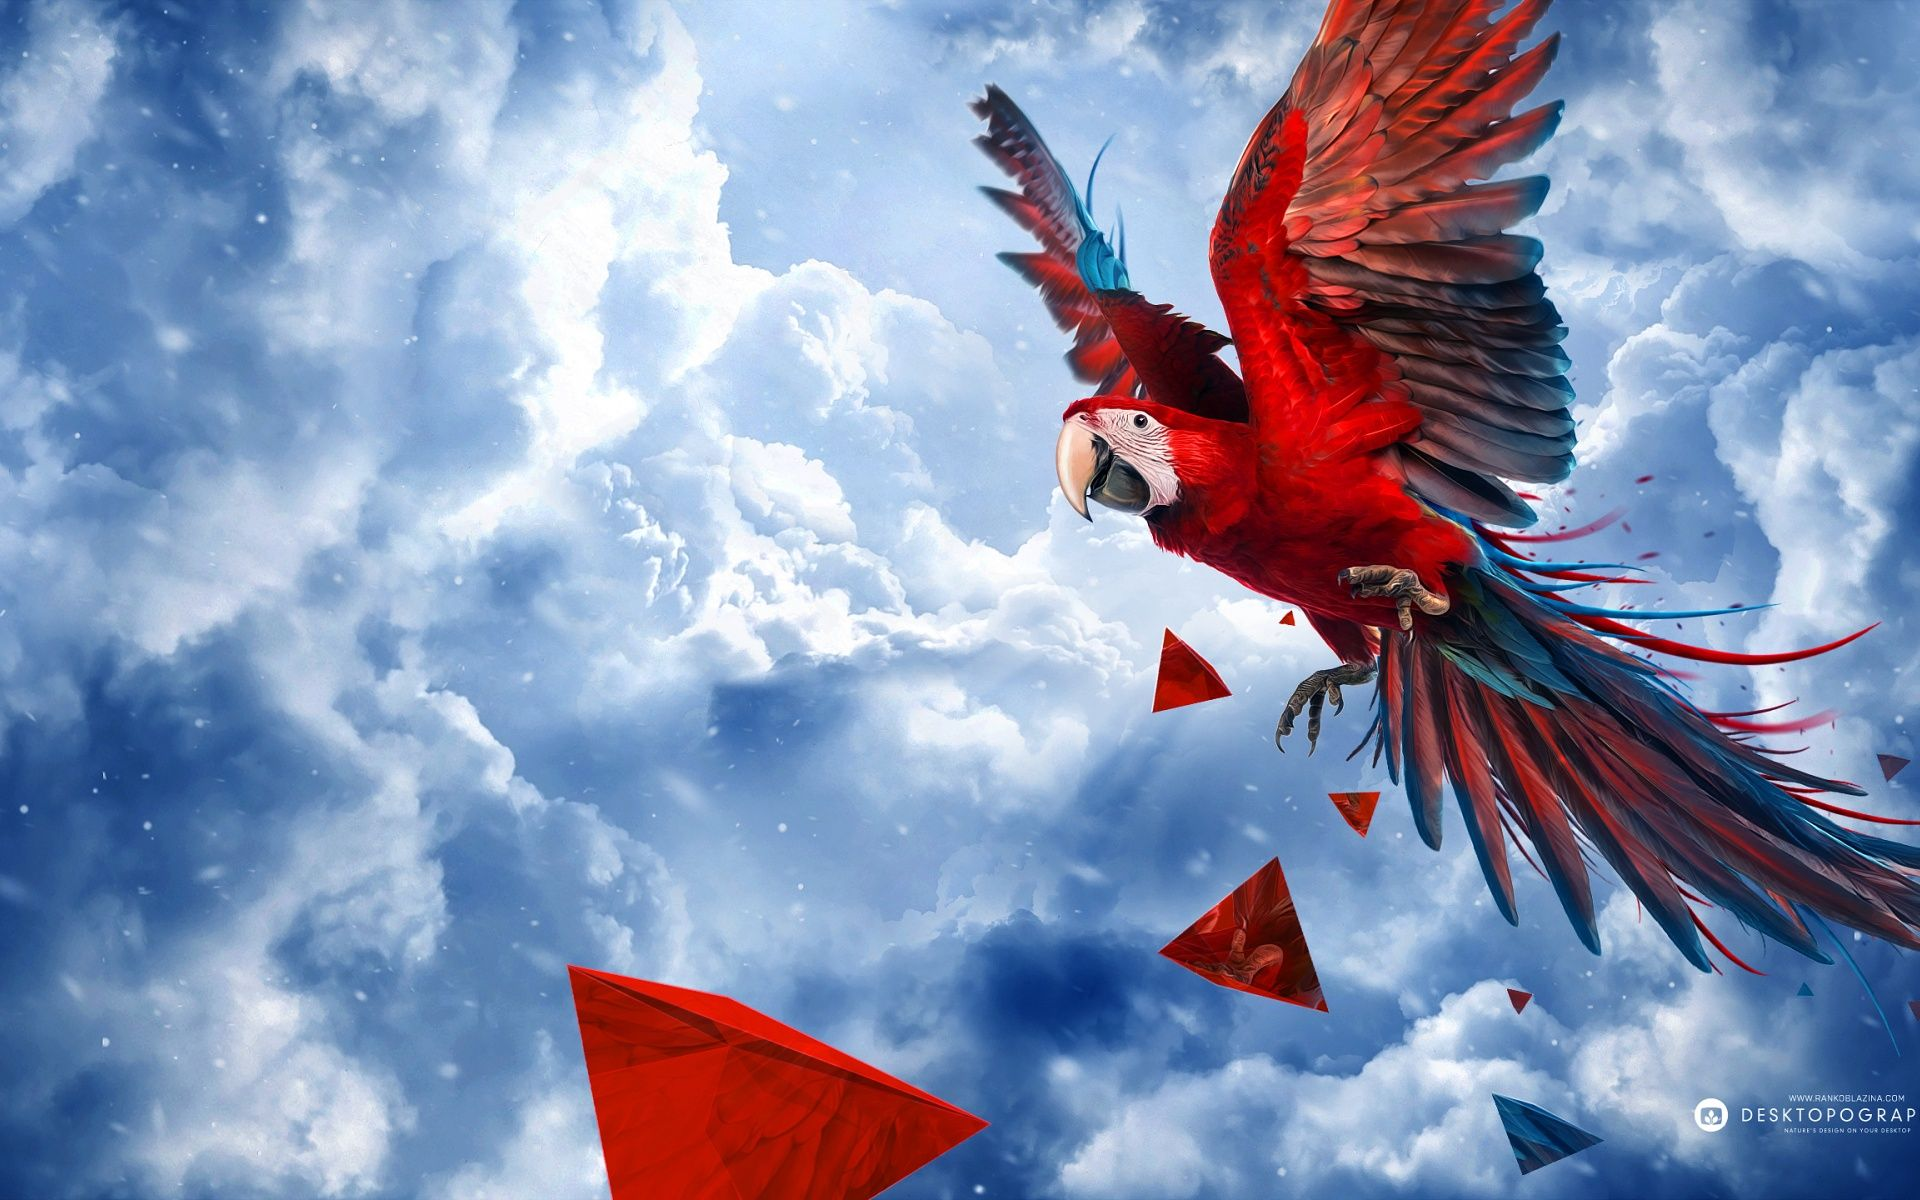 Next Generation Wallpapers Parrot Blue Sky Art Wide Jpg 1920 1200 Parrot Painting Bird Wallpaper Blue Sky Images